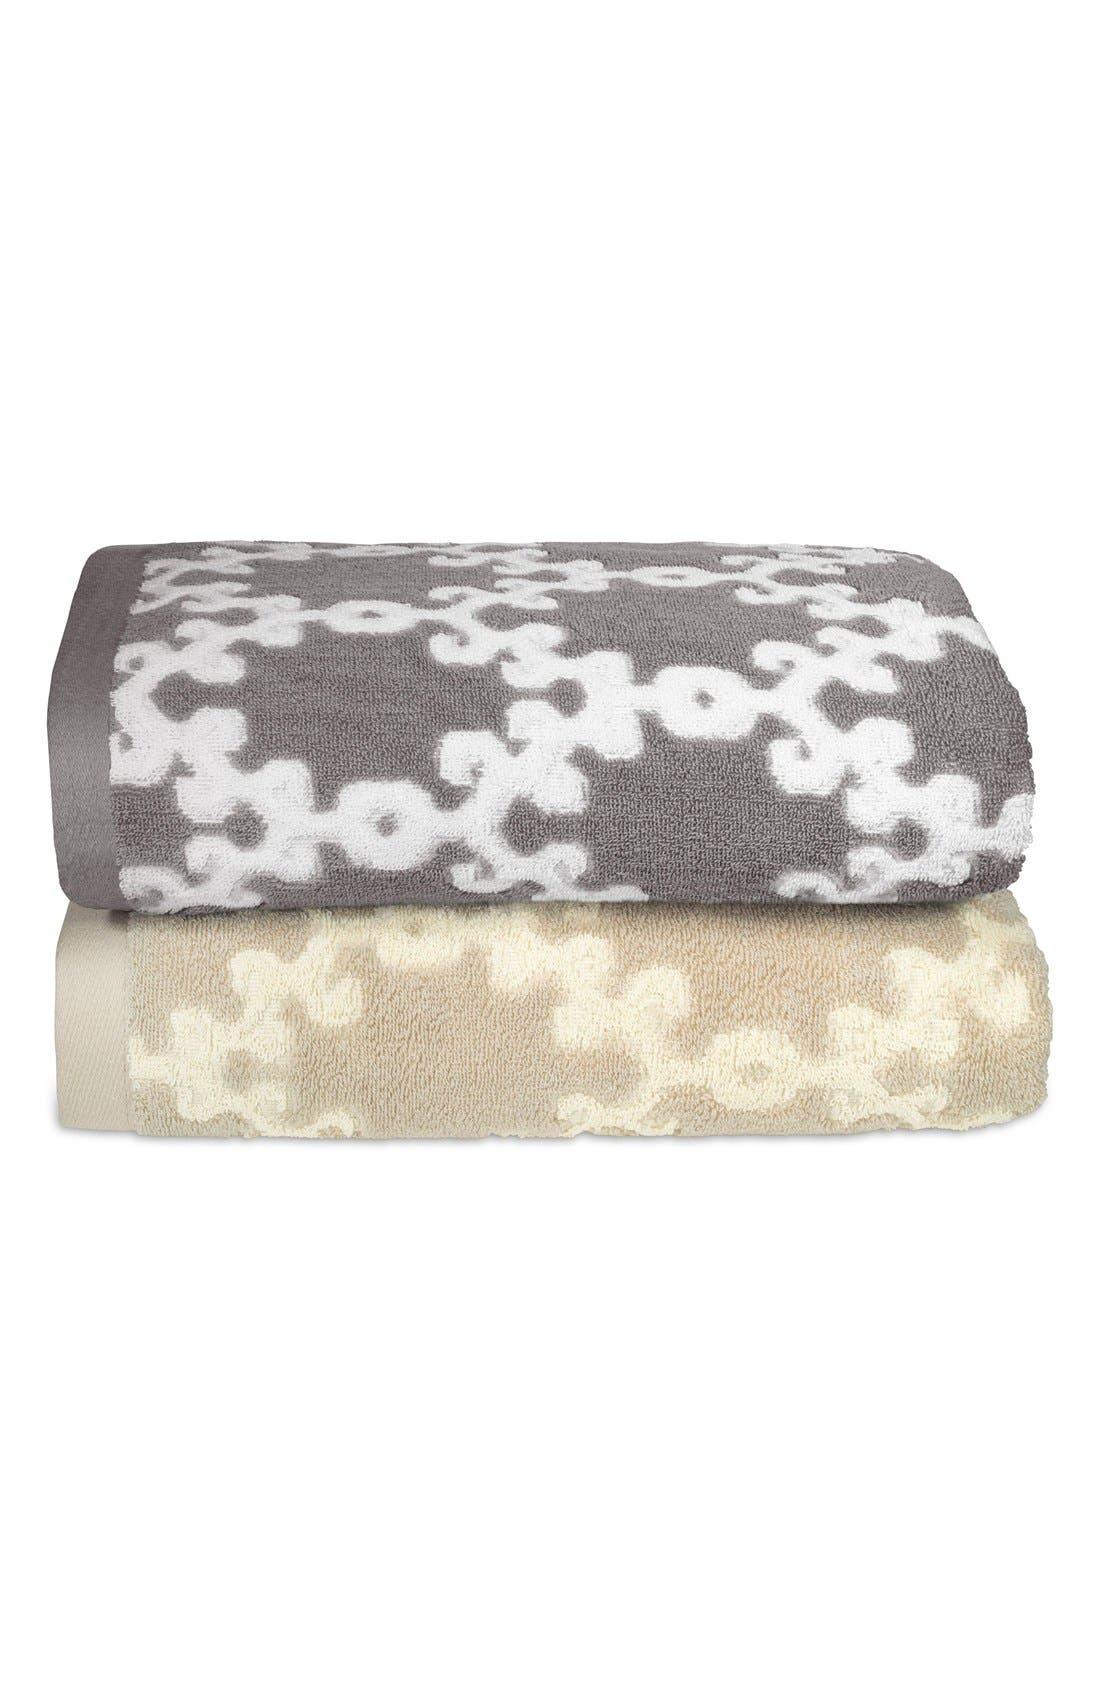 Alternate Image 1 Selected - John Robshaw 'Totem' Turkish Cotton Bath Towel